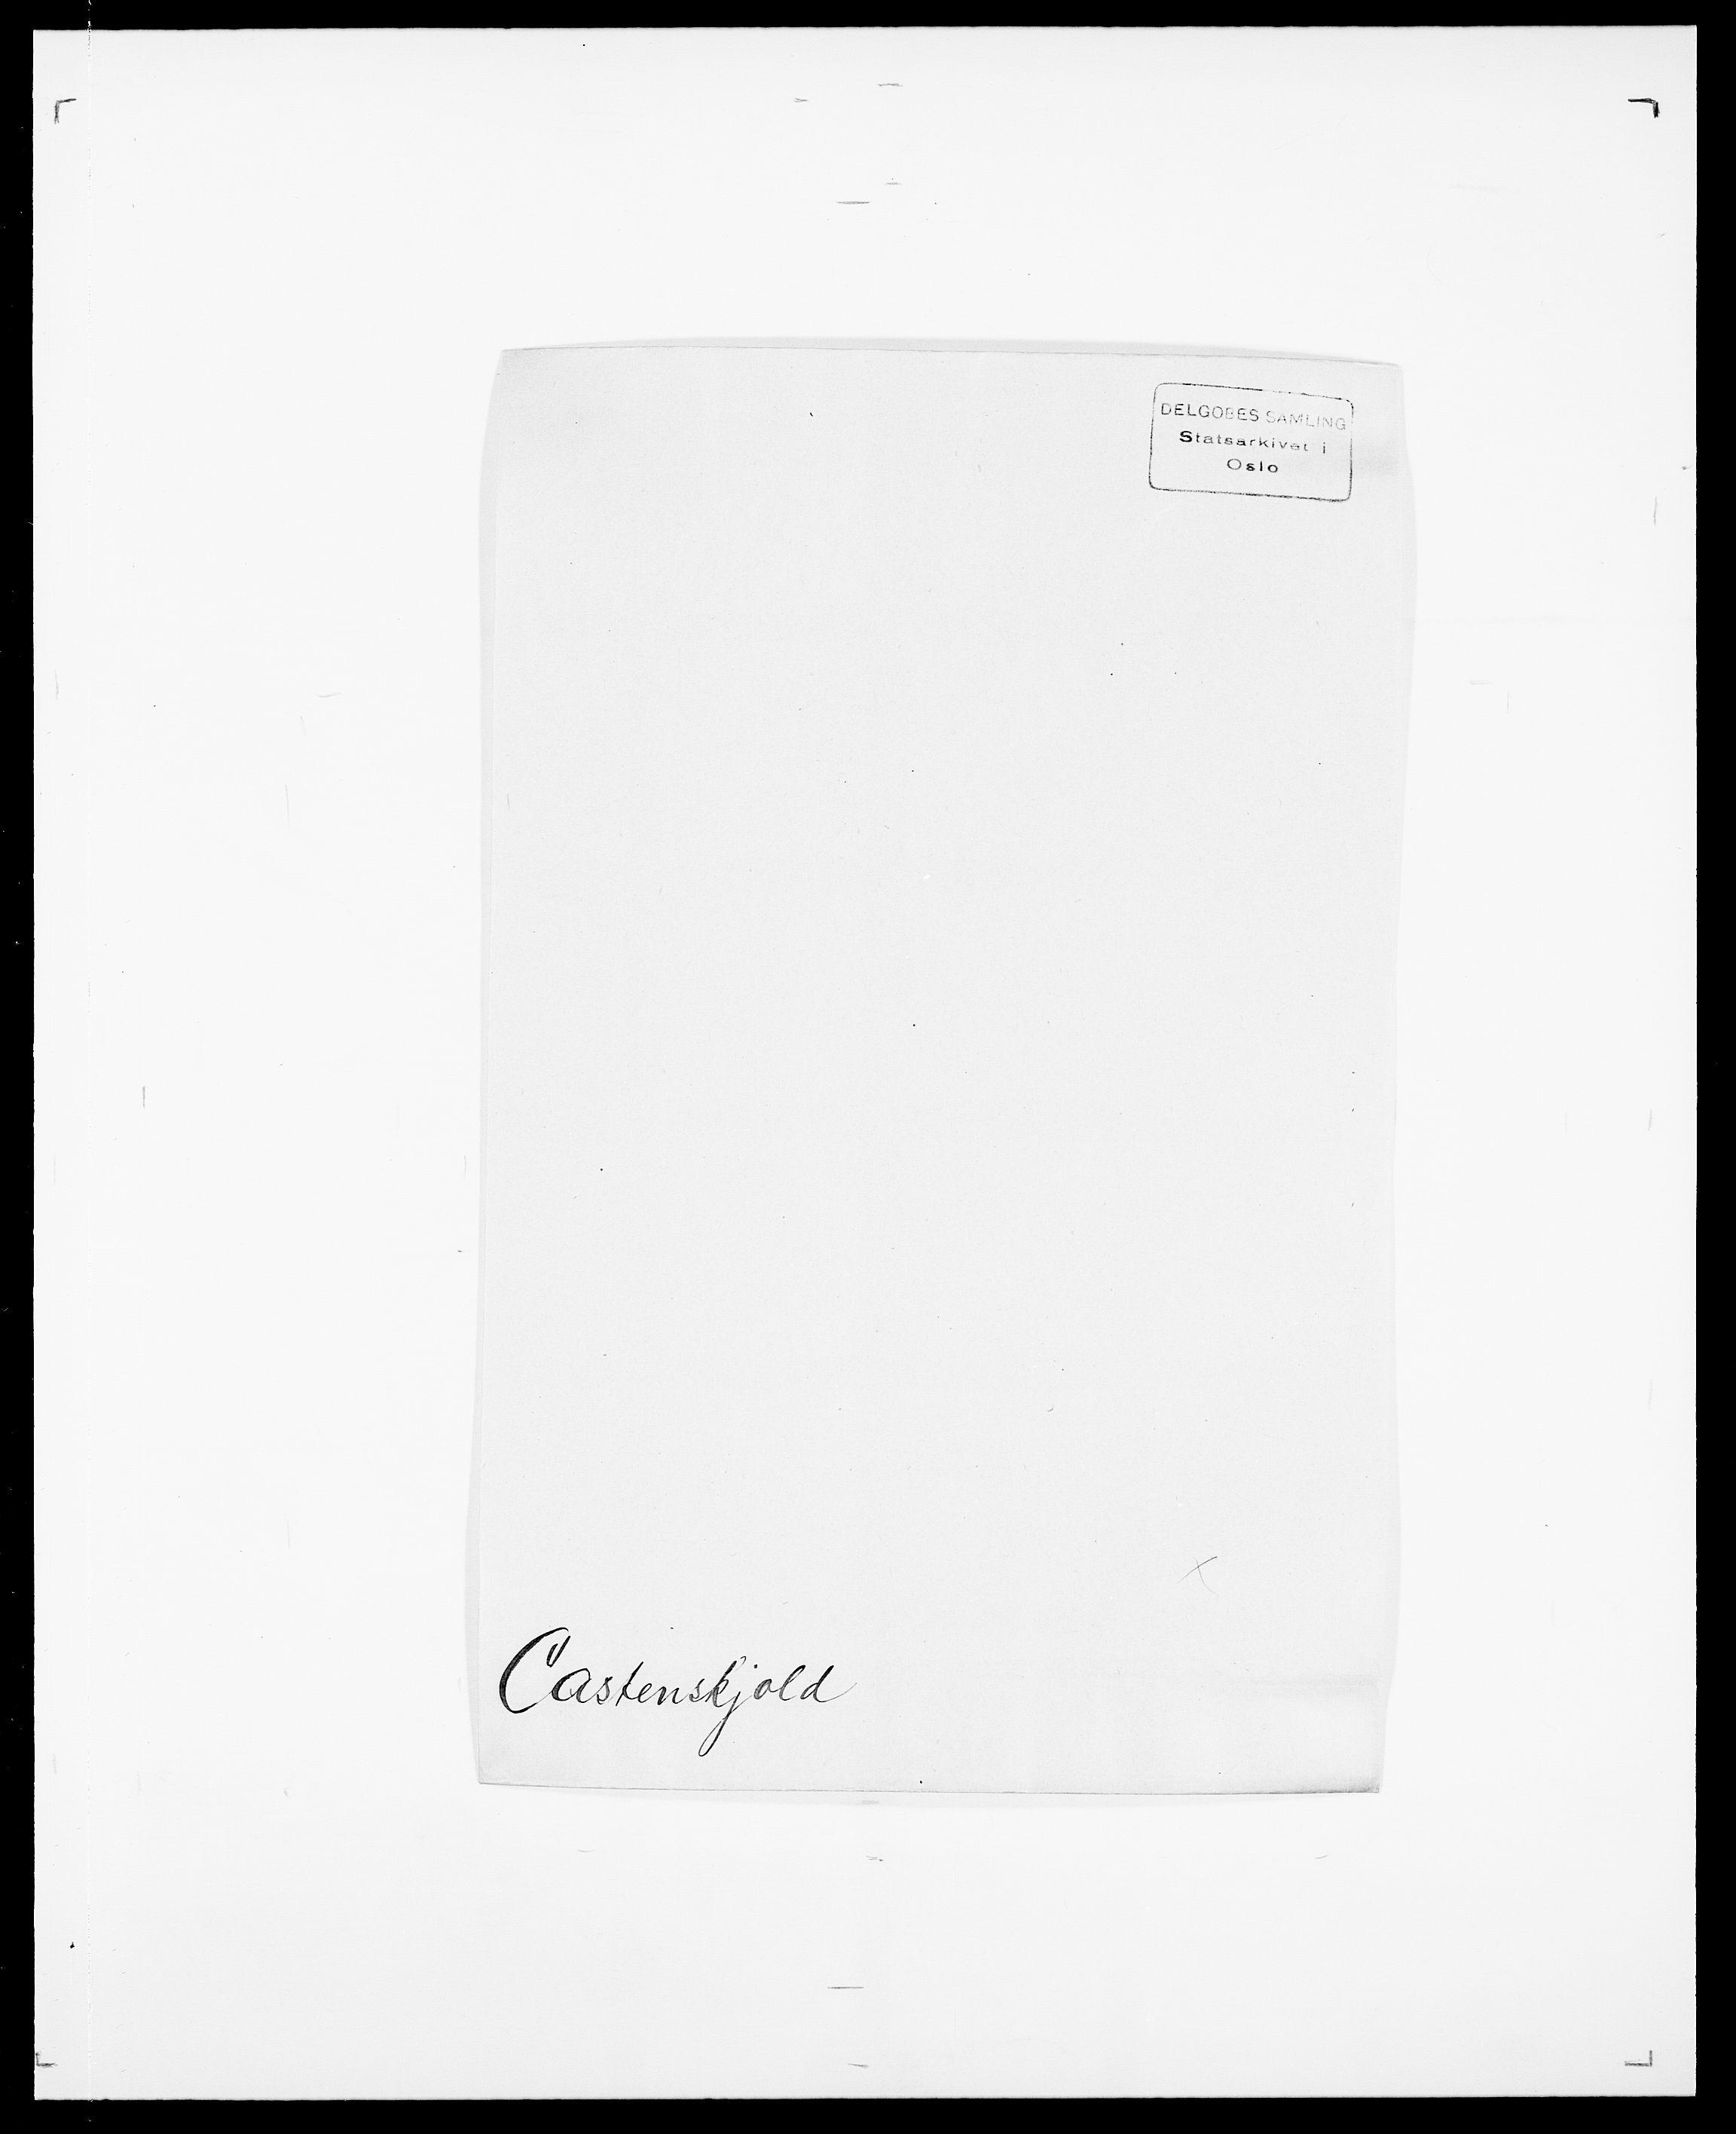 SAO, Delgobe, Charles Antoine - samling, D/Da/L0008: Capjon - Dagenbolt, s. 149